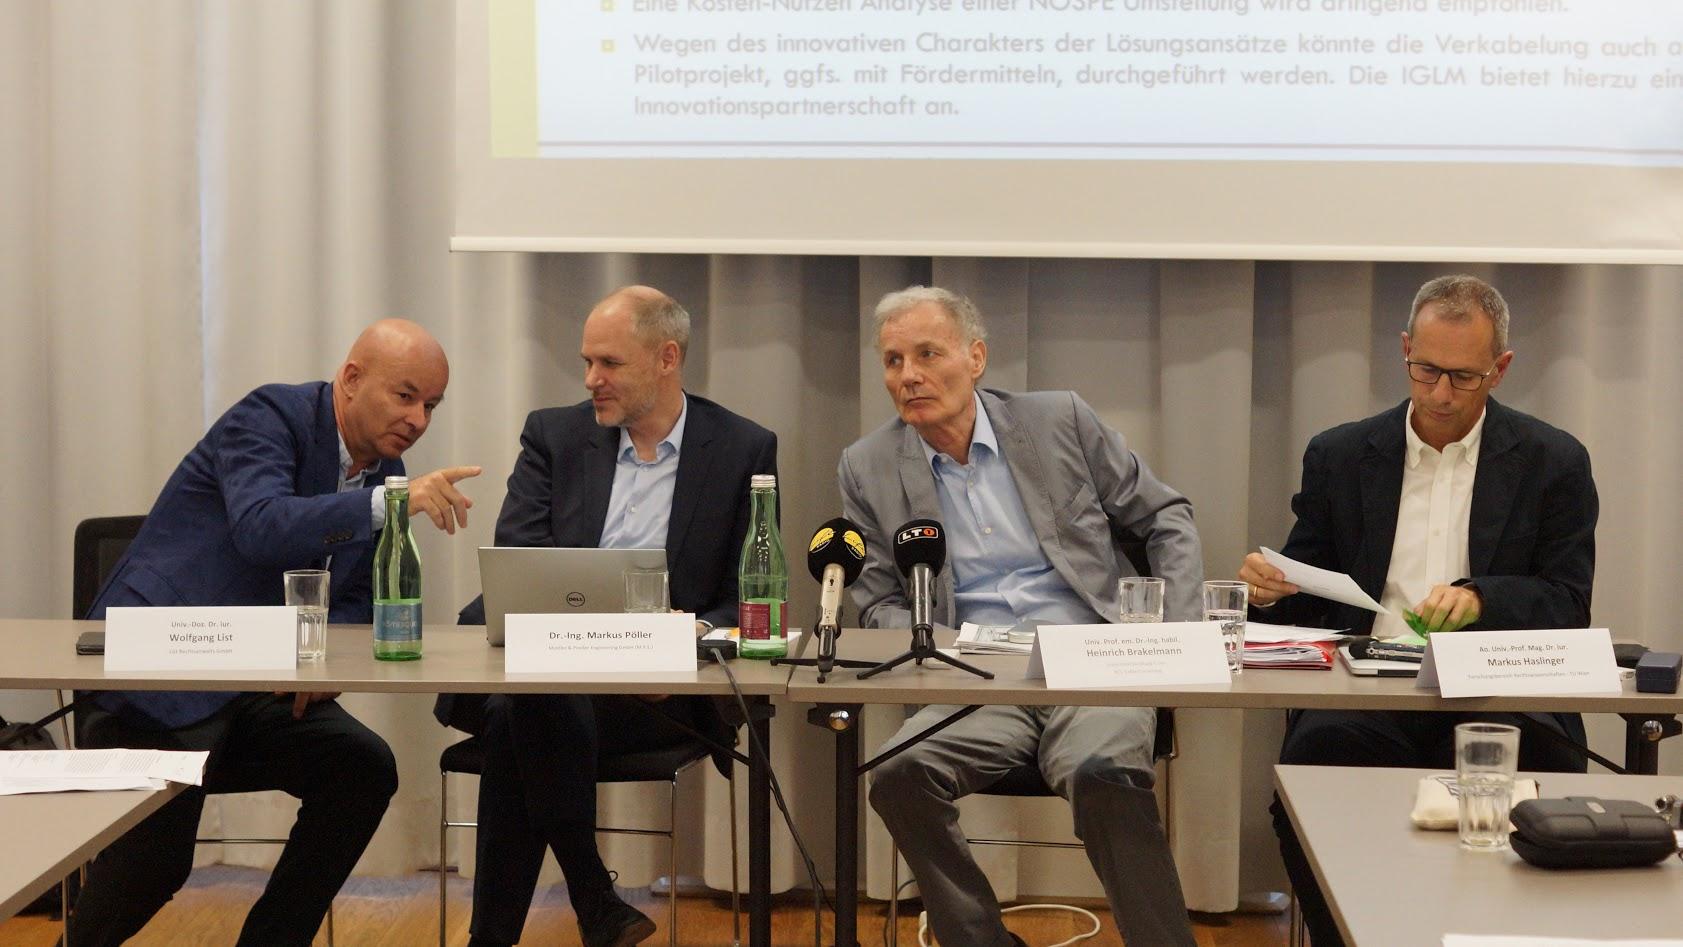 iglm-informiert-3-pressekonferenz